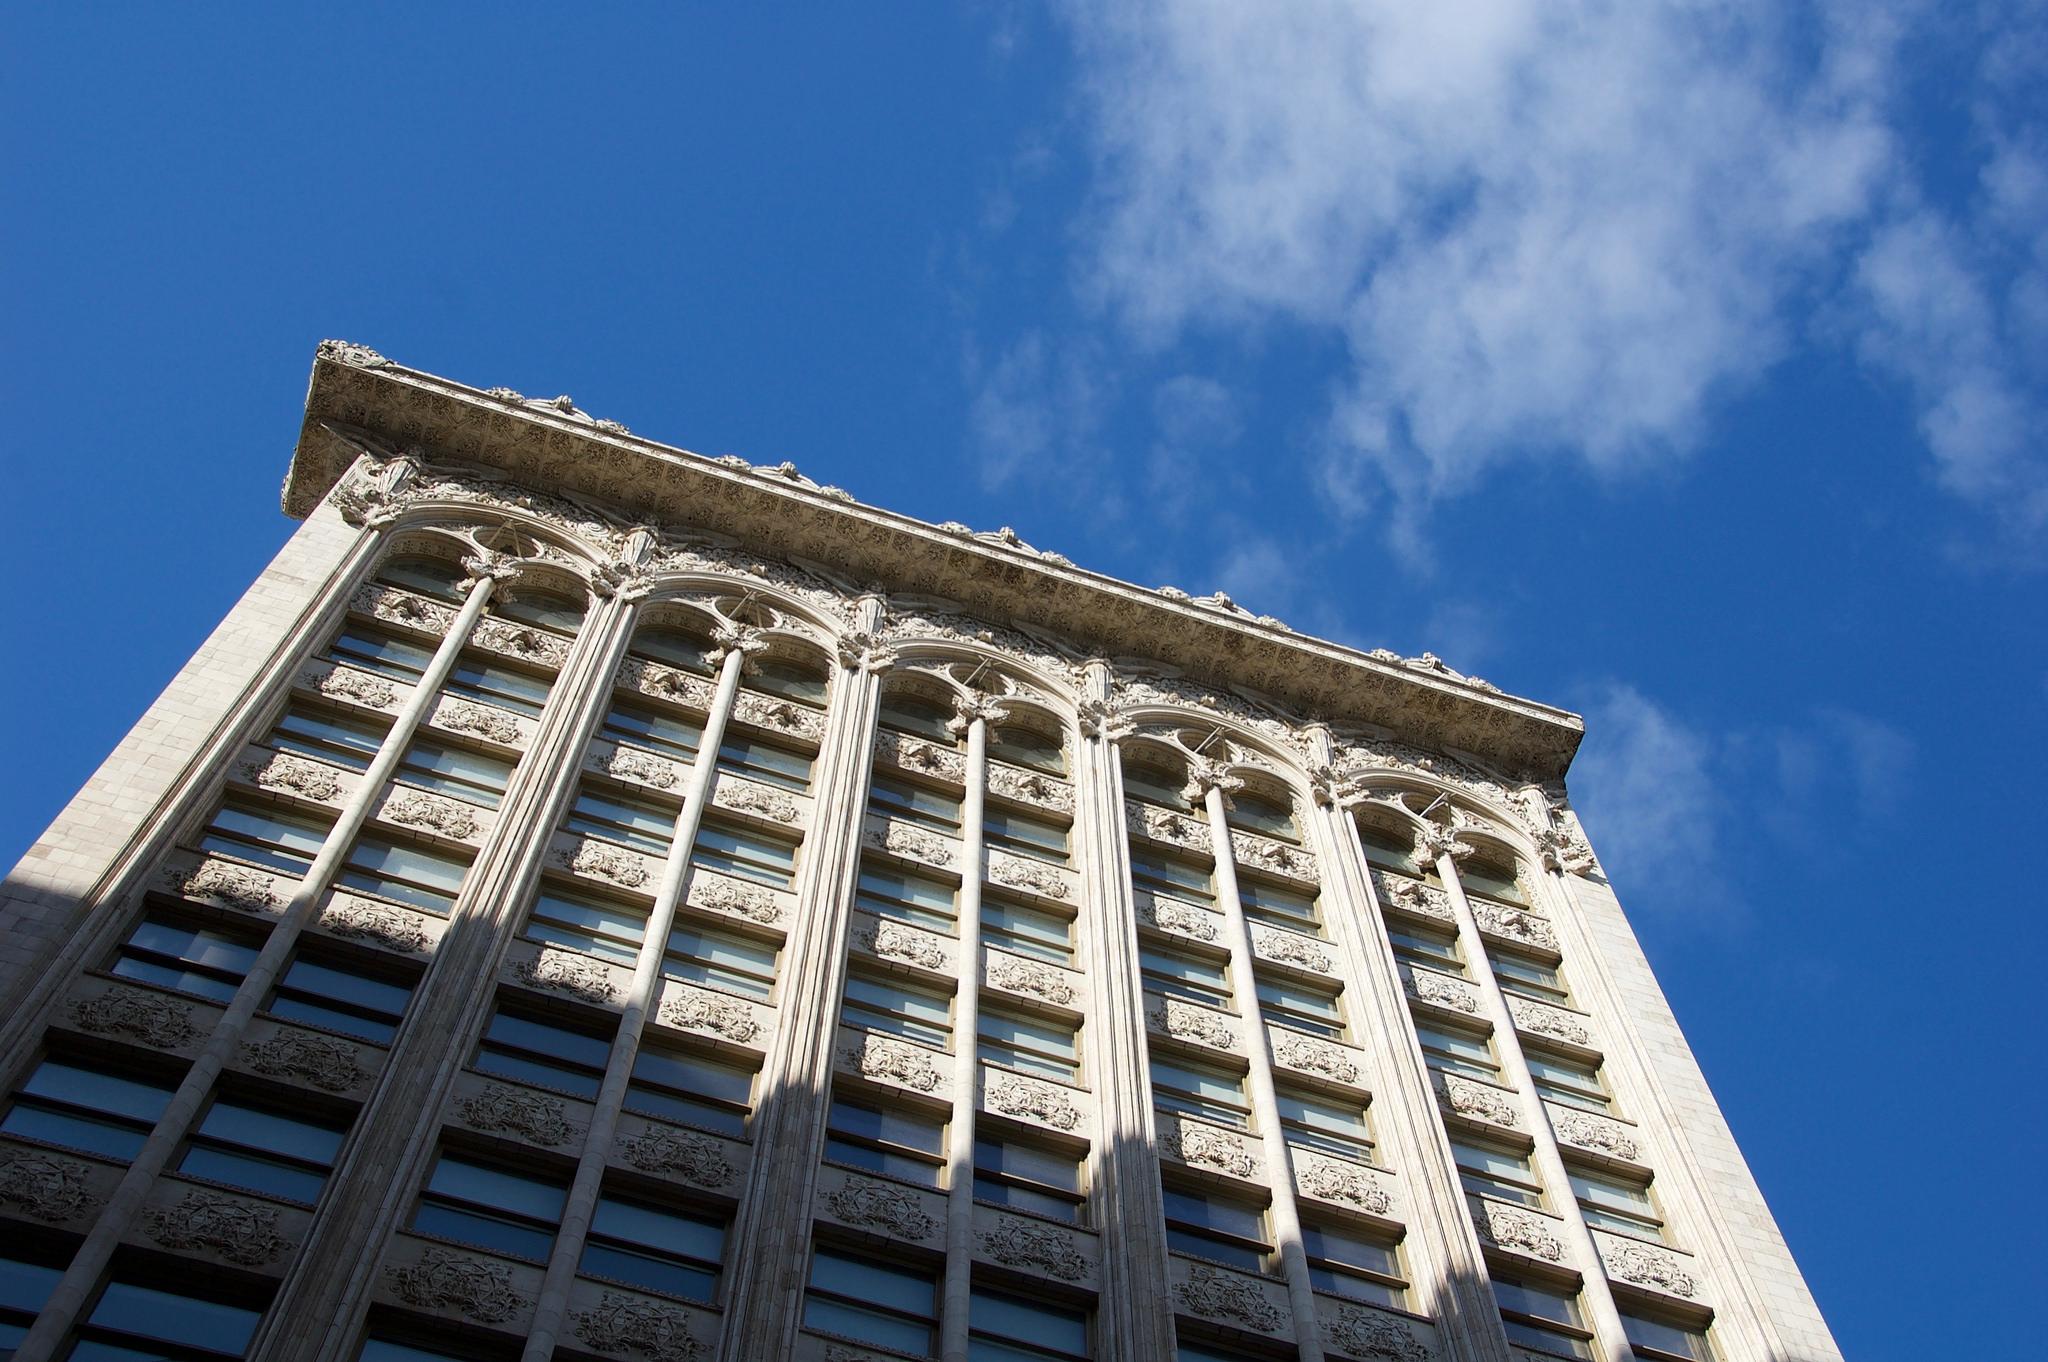 bayard building, bayard-condict, nyc buildings